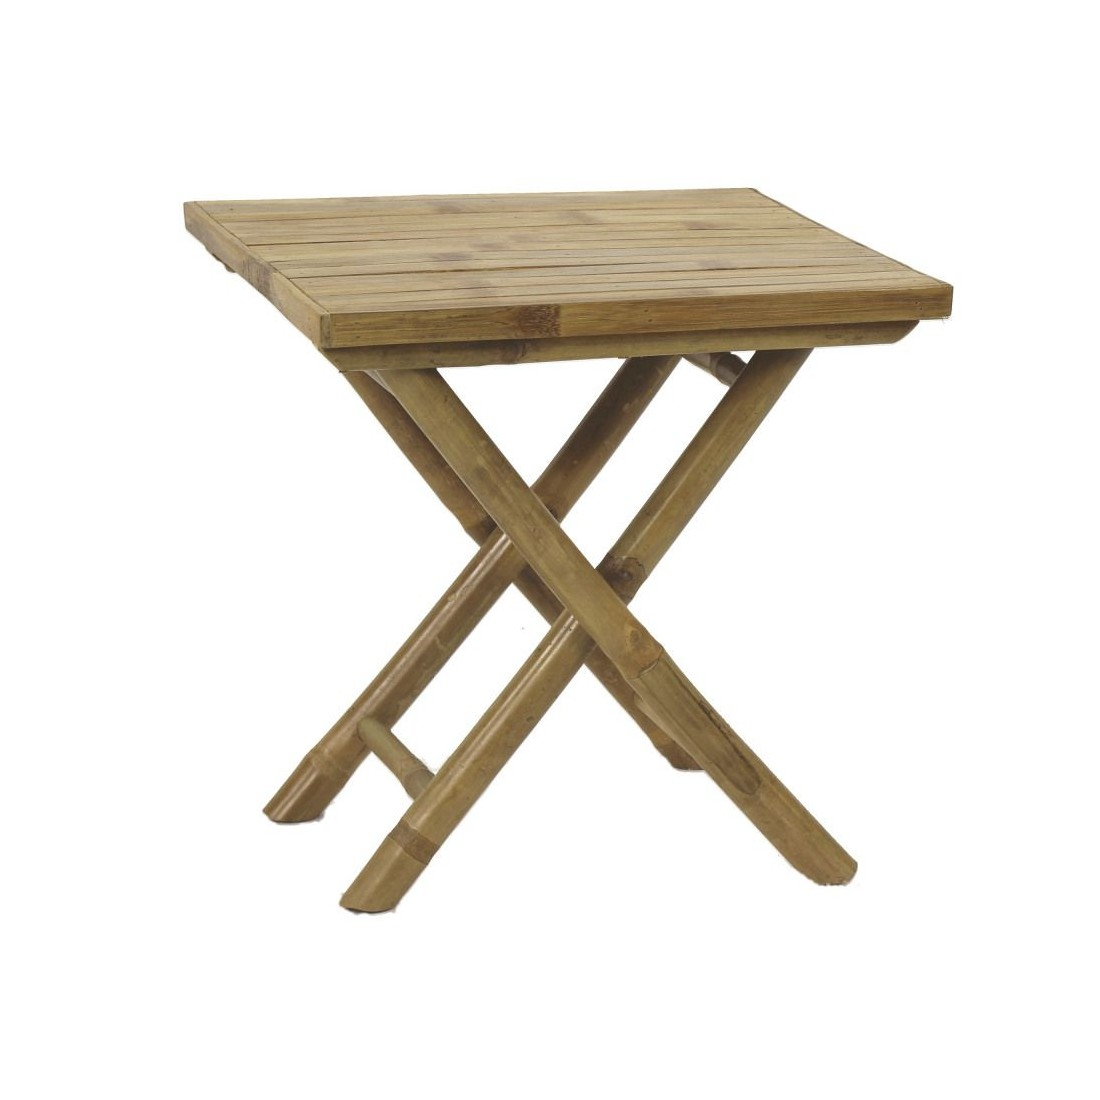 Table basse en bambou Cây Tre